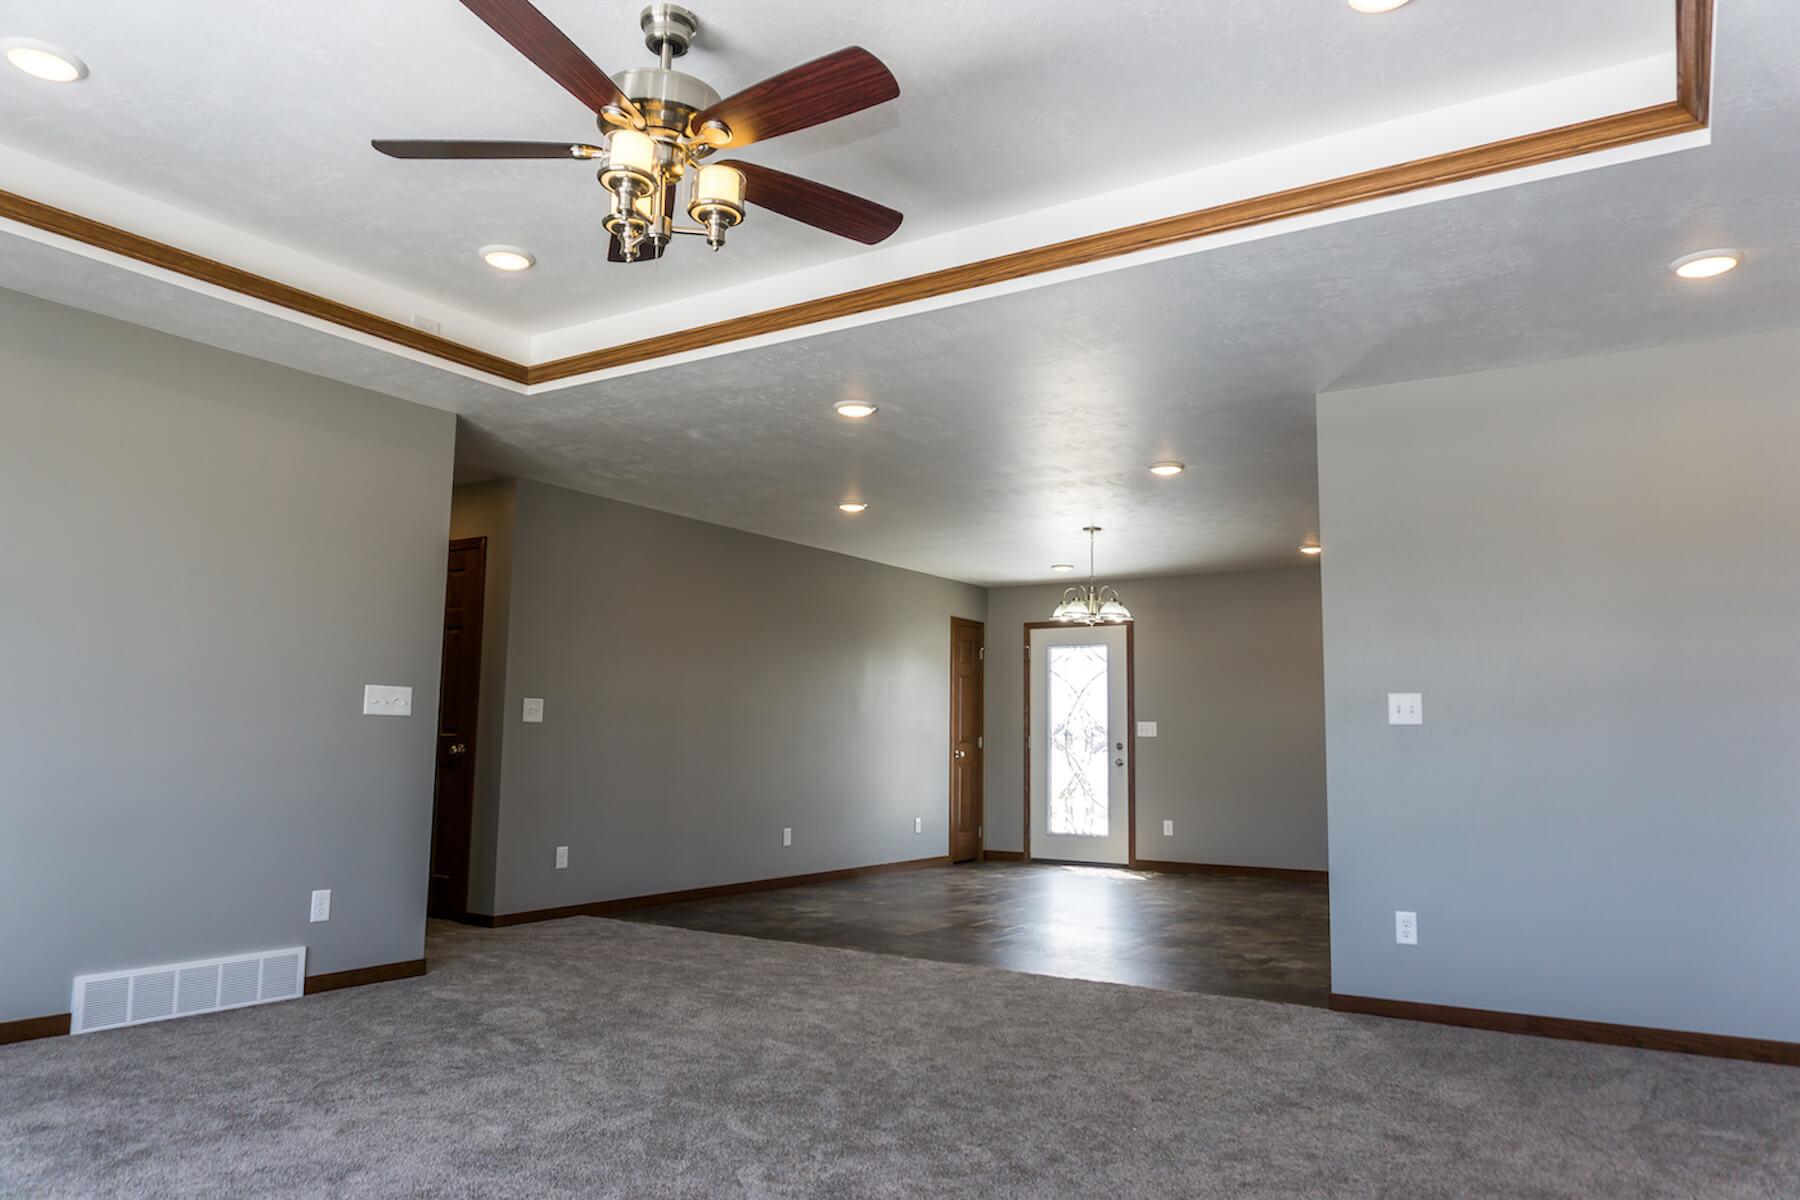 2019-4-12 Kemper Avenue Builders FirstSource Compressed  9.jpg